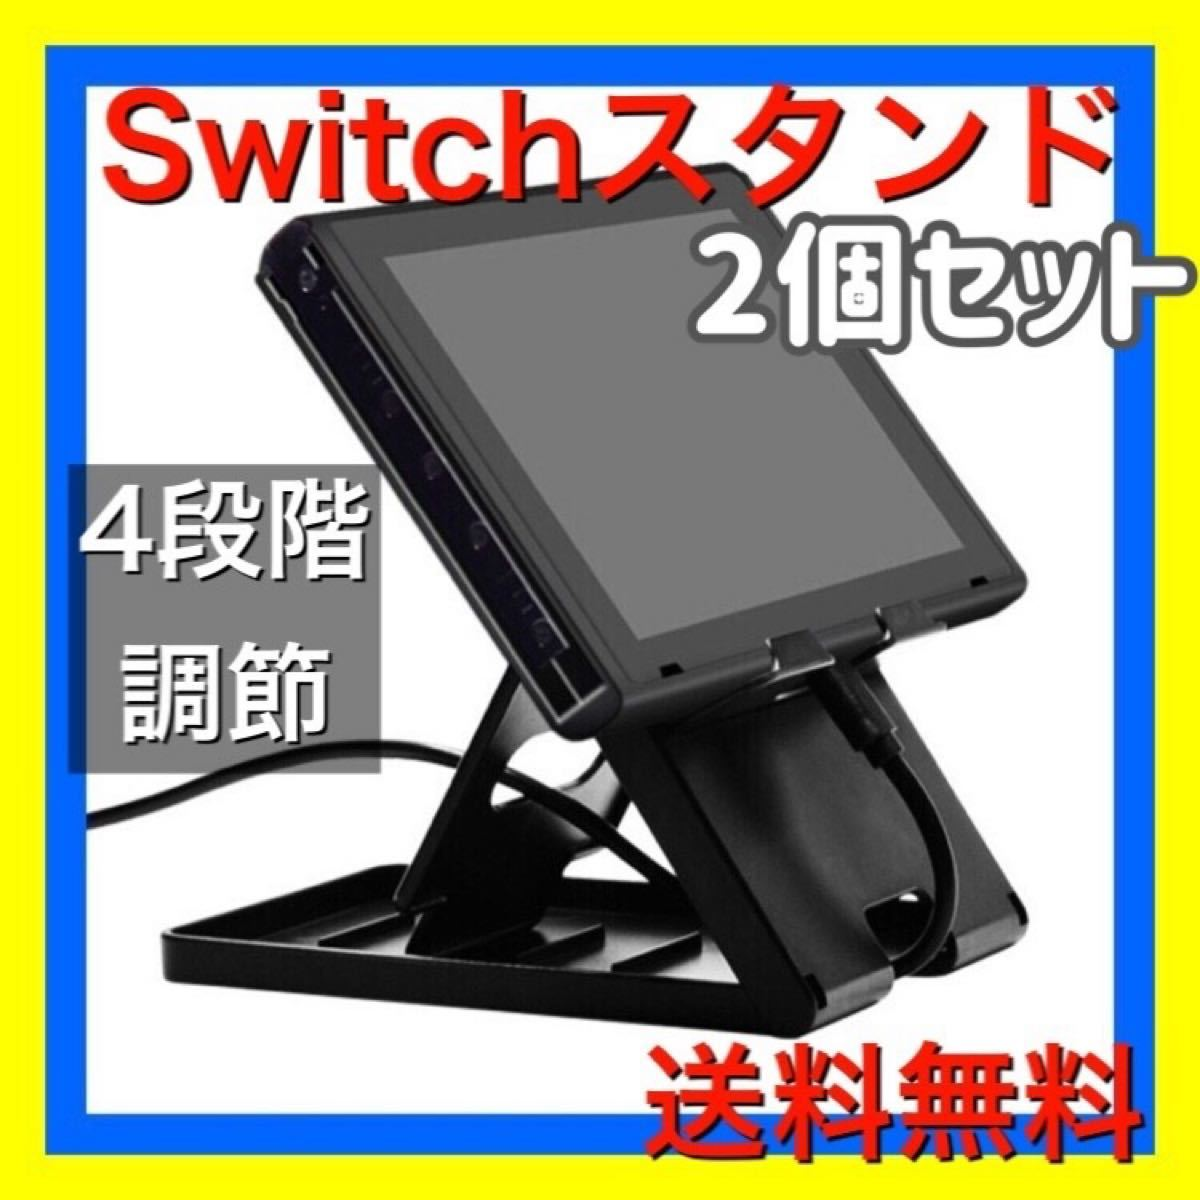 Nintendo Switch ポータブルスタンド 4段階調節 任天堂スイッチ 折りたたみスタンド ニンテンドー【2個セット】